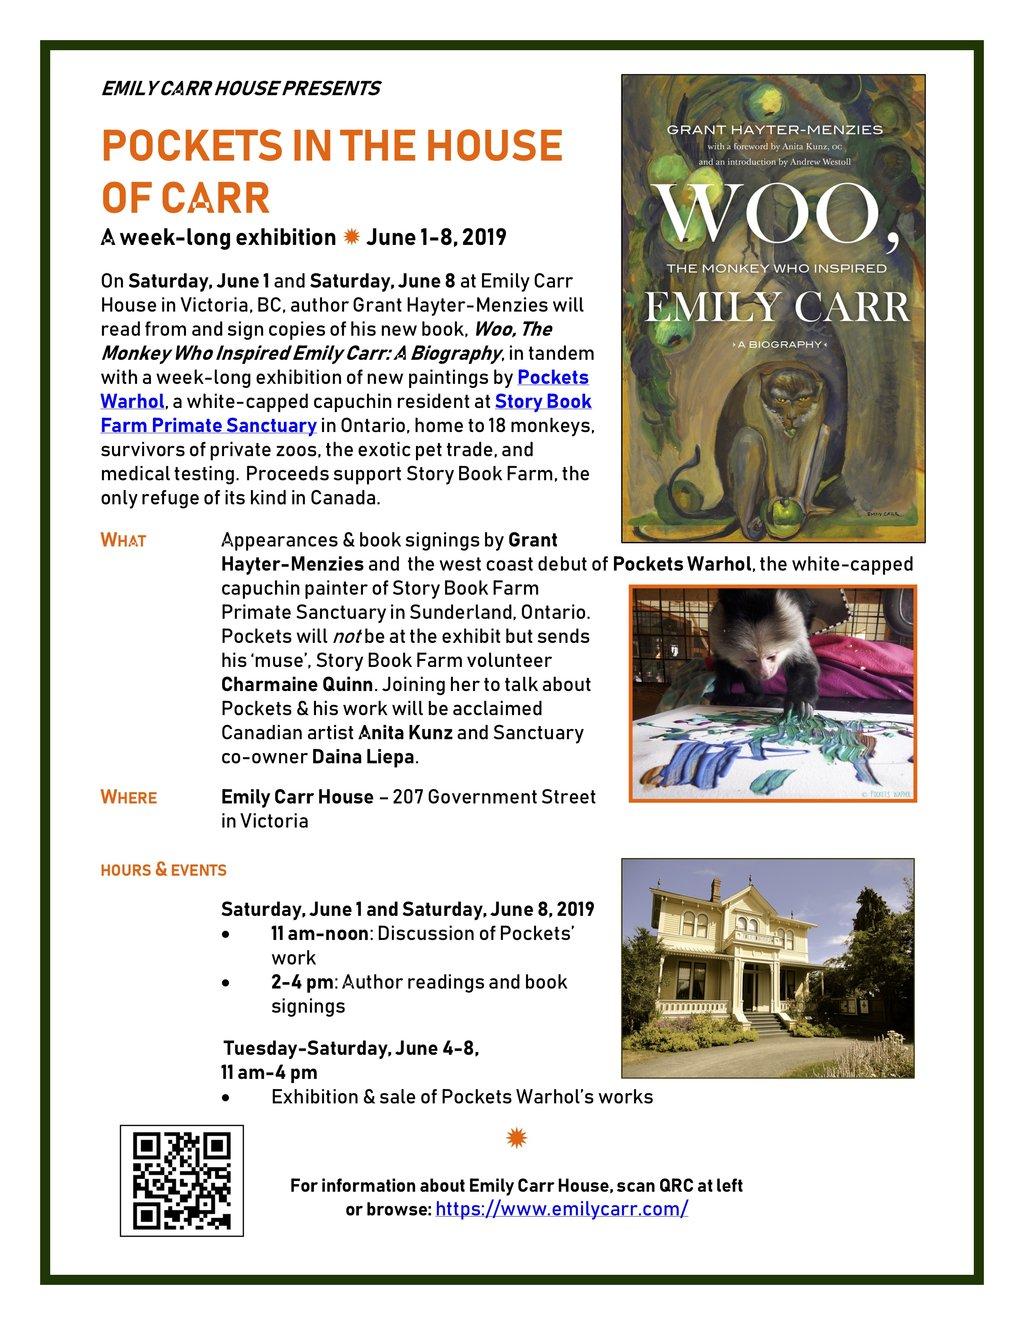 Pockets in the House of Carr: Grant Hayter-Menzies, Anita Kunz, OC